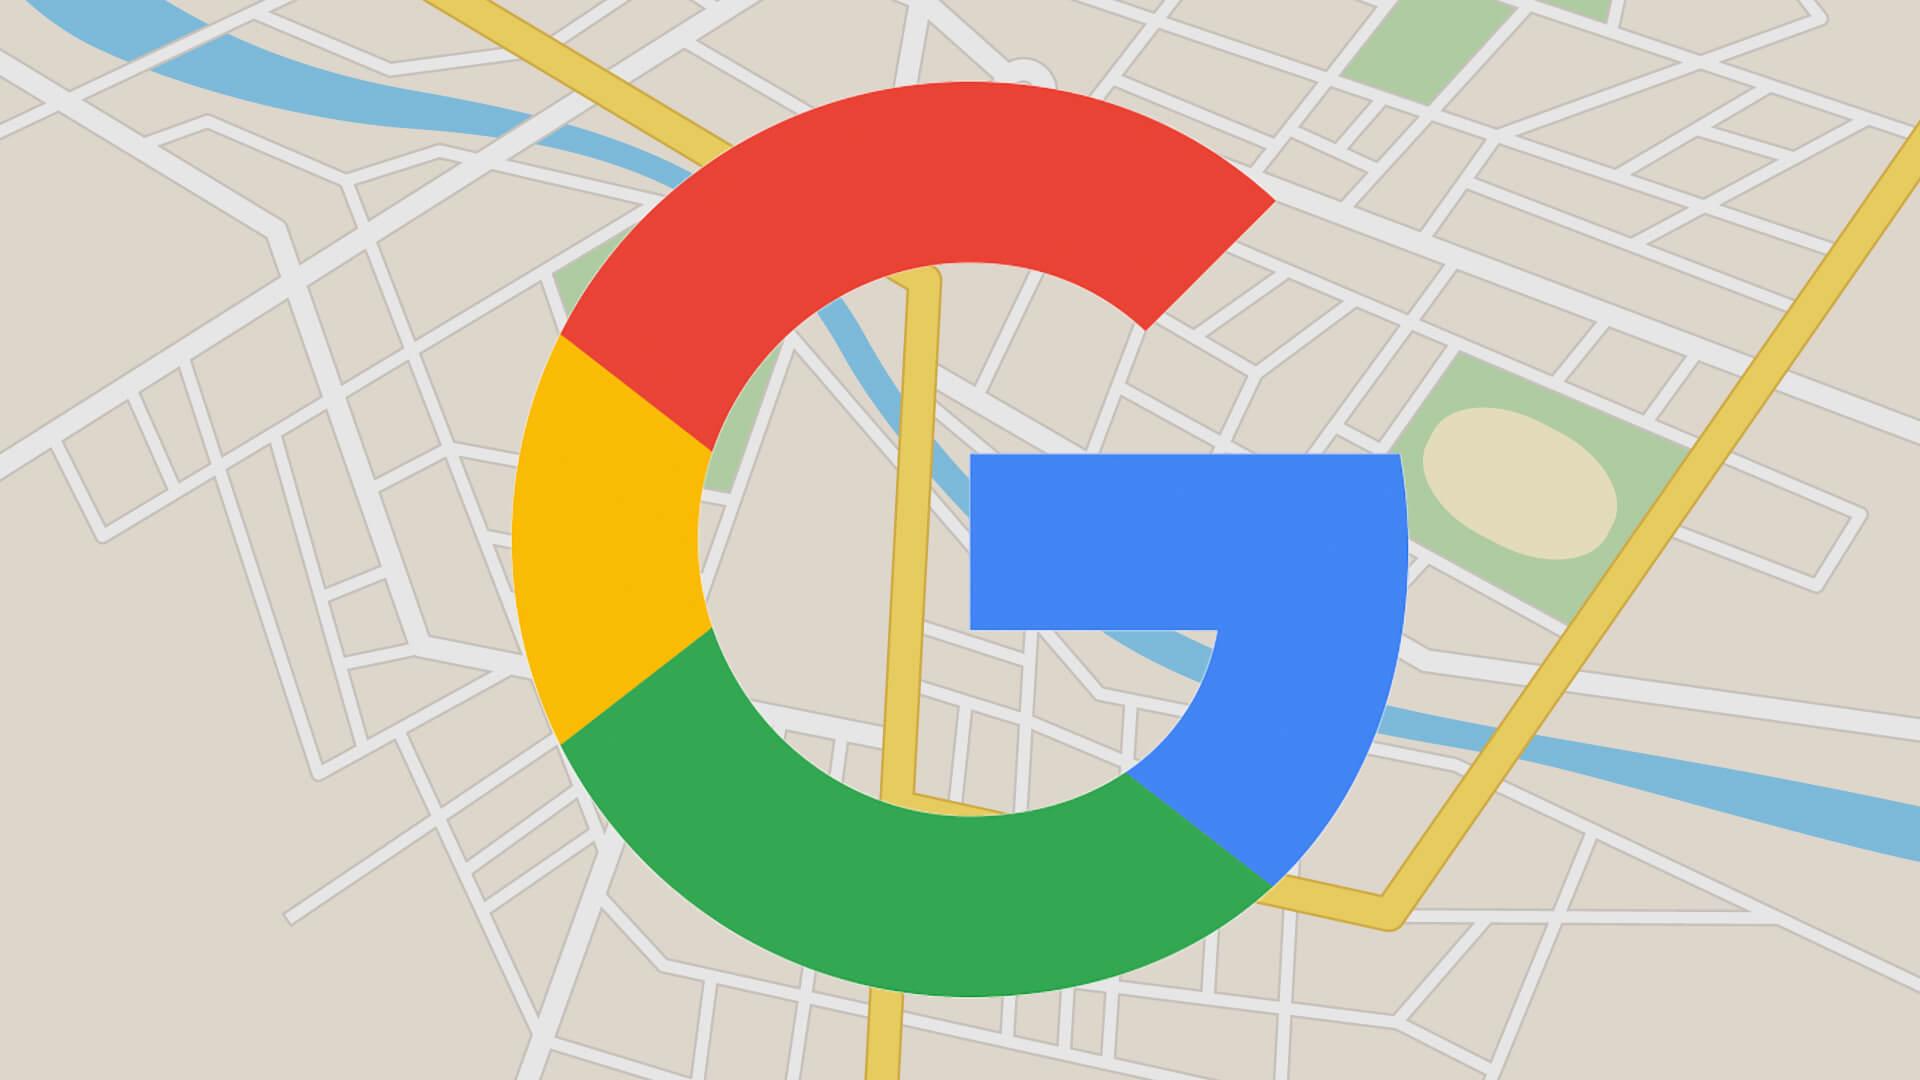 El programa 'My Business Provider' de Google reemplaza al 'Verificador de confianza' para el alcance de GMB